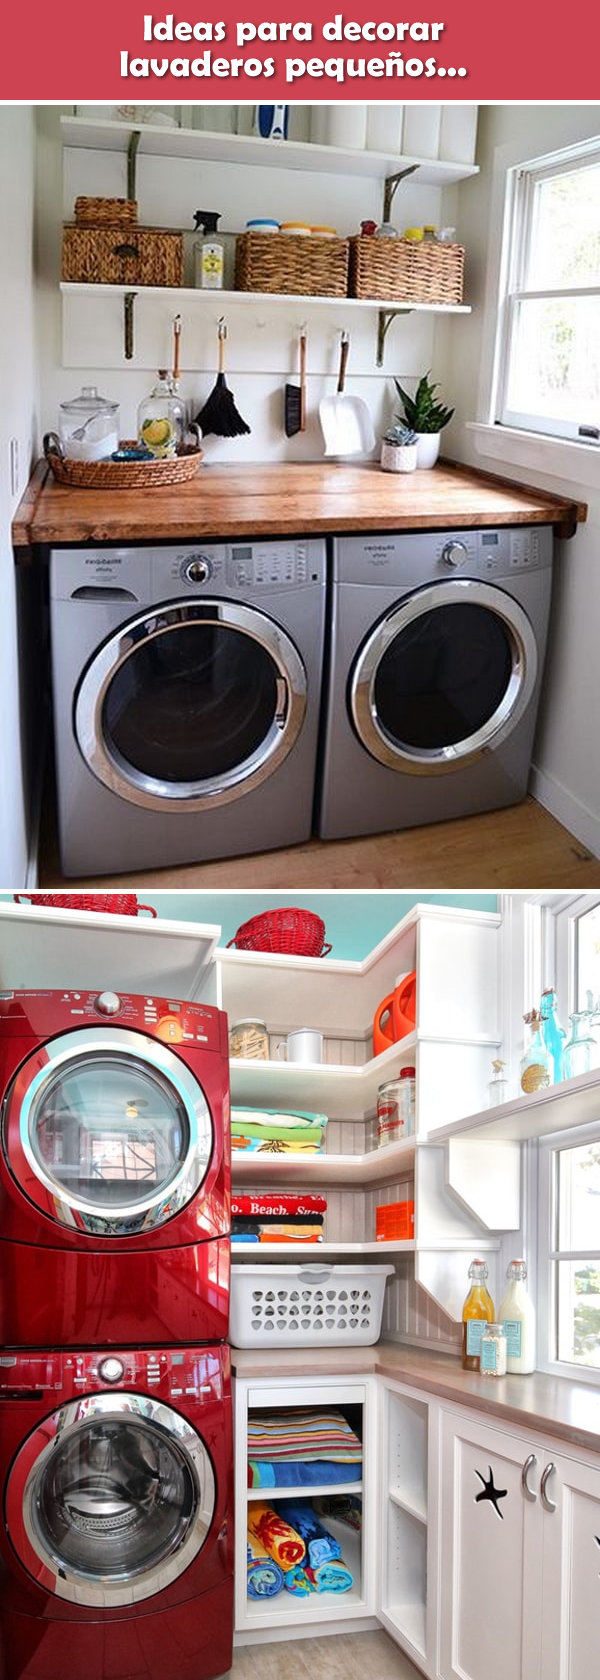 ideas para lavaderos peque os decoraci n para On ideas lavaderos pequenos